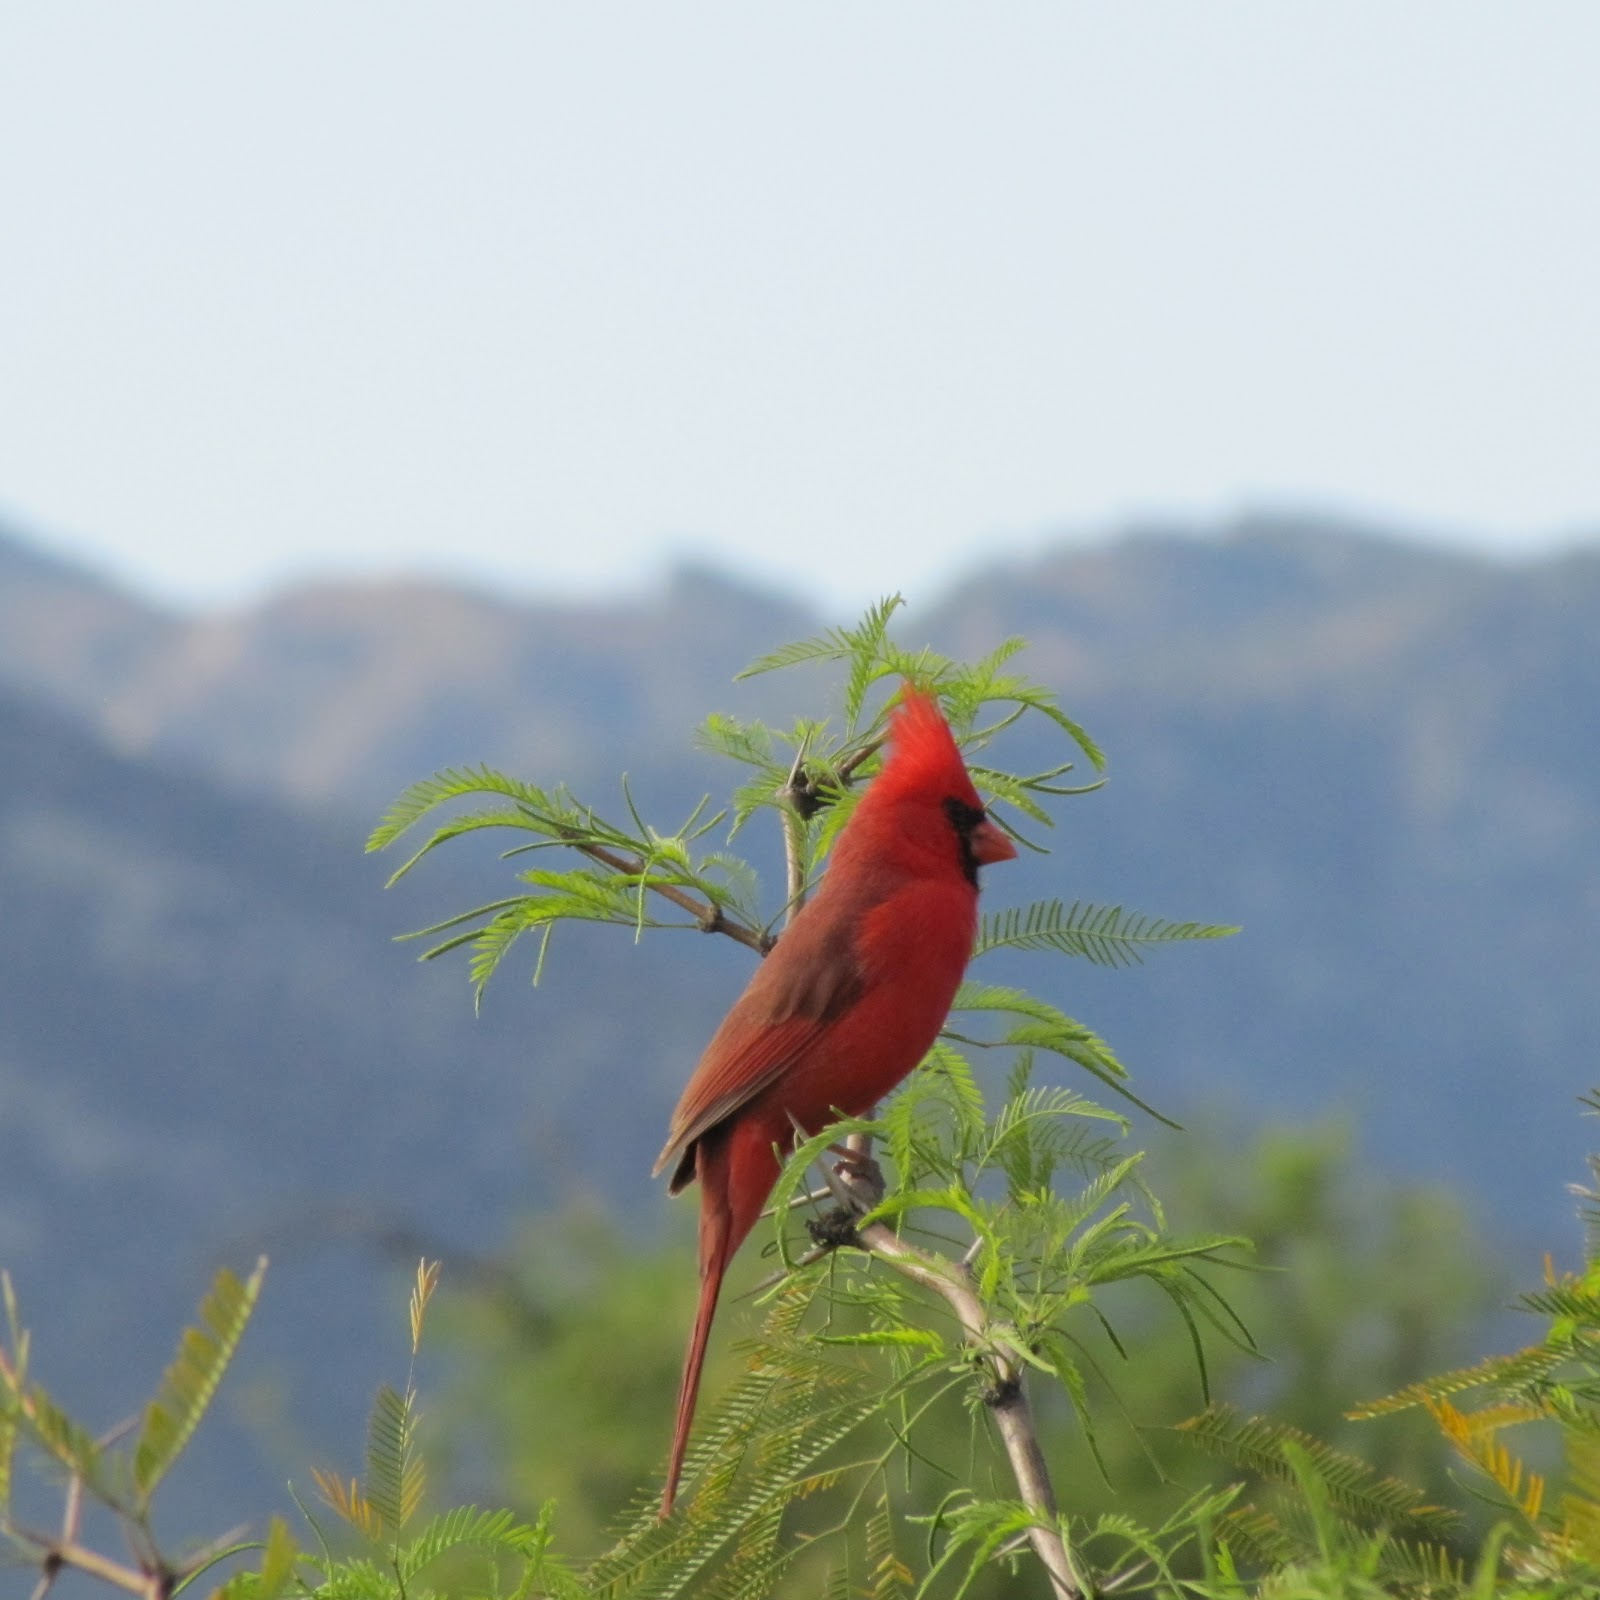 Free Download Wallpaper HD : Sparrow Bird High Resolution